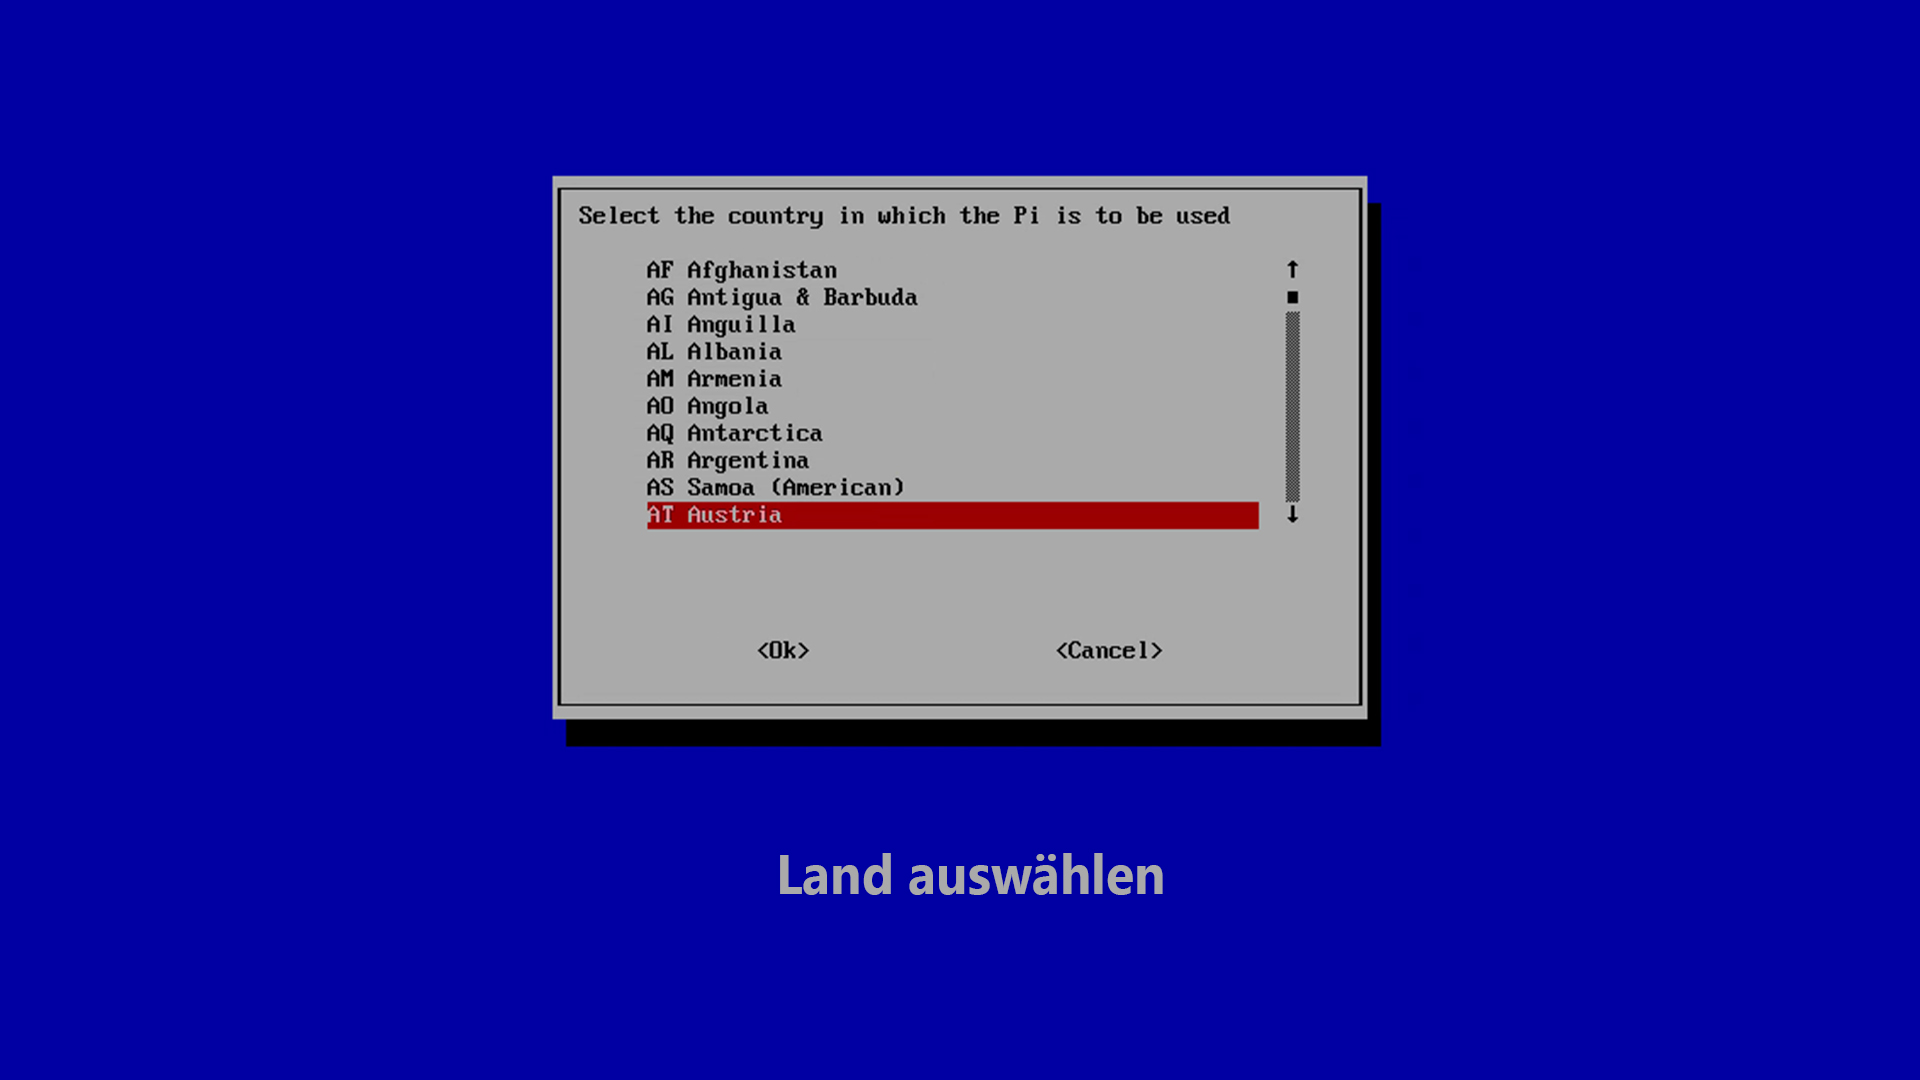 DigitaleWelt RetroPie Anleitung - Wi-fi Land auswählen